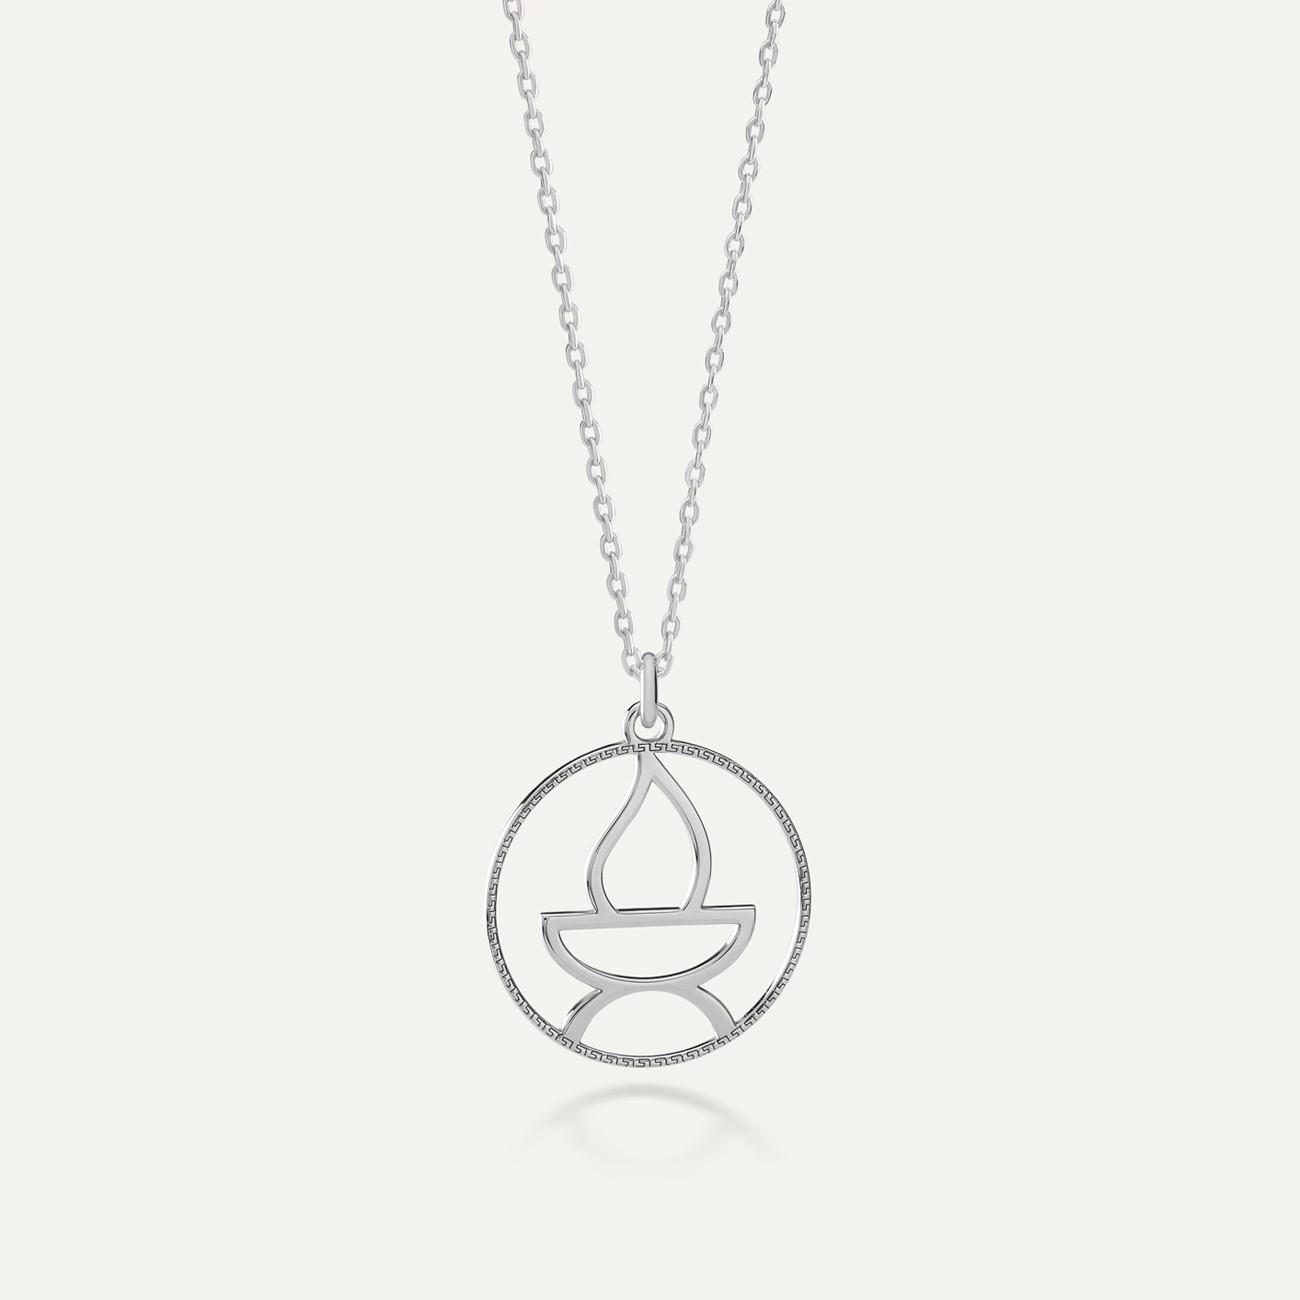 Srebrny naszyjnik bogowie greccy - Hefajstos MON DÉFI